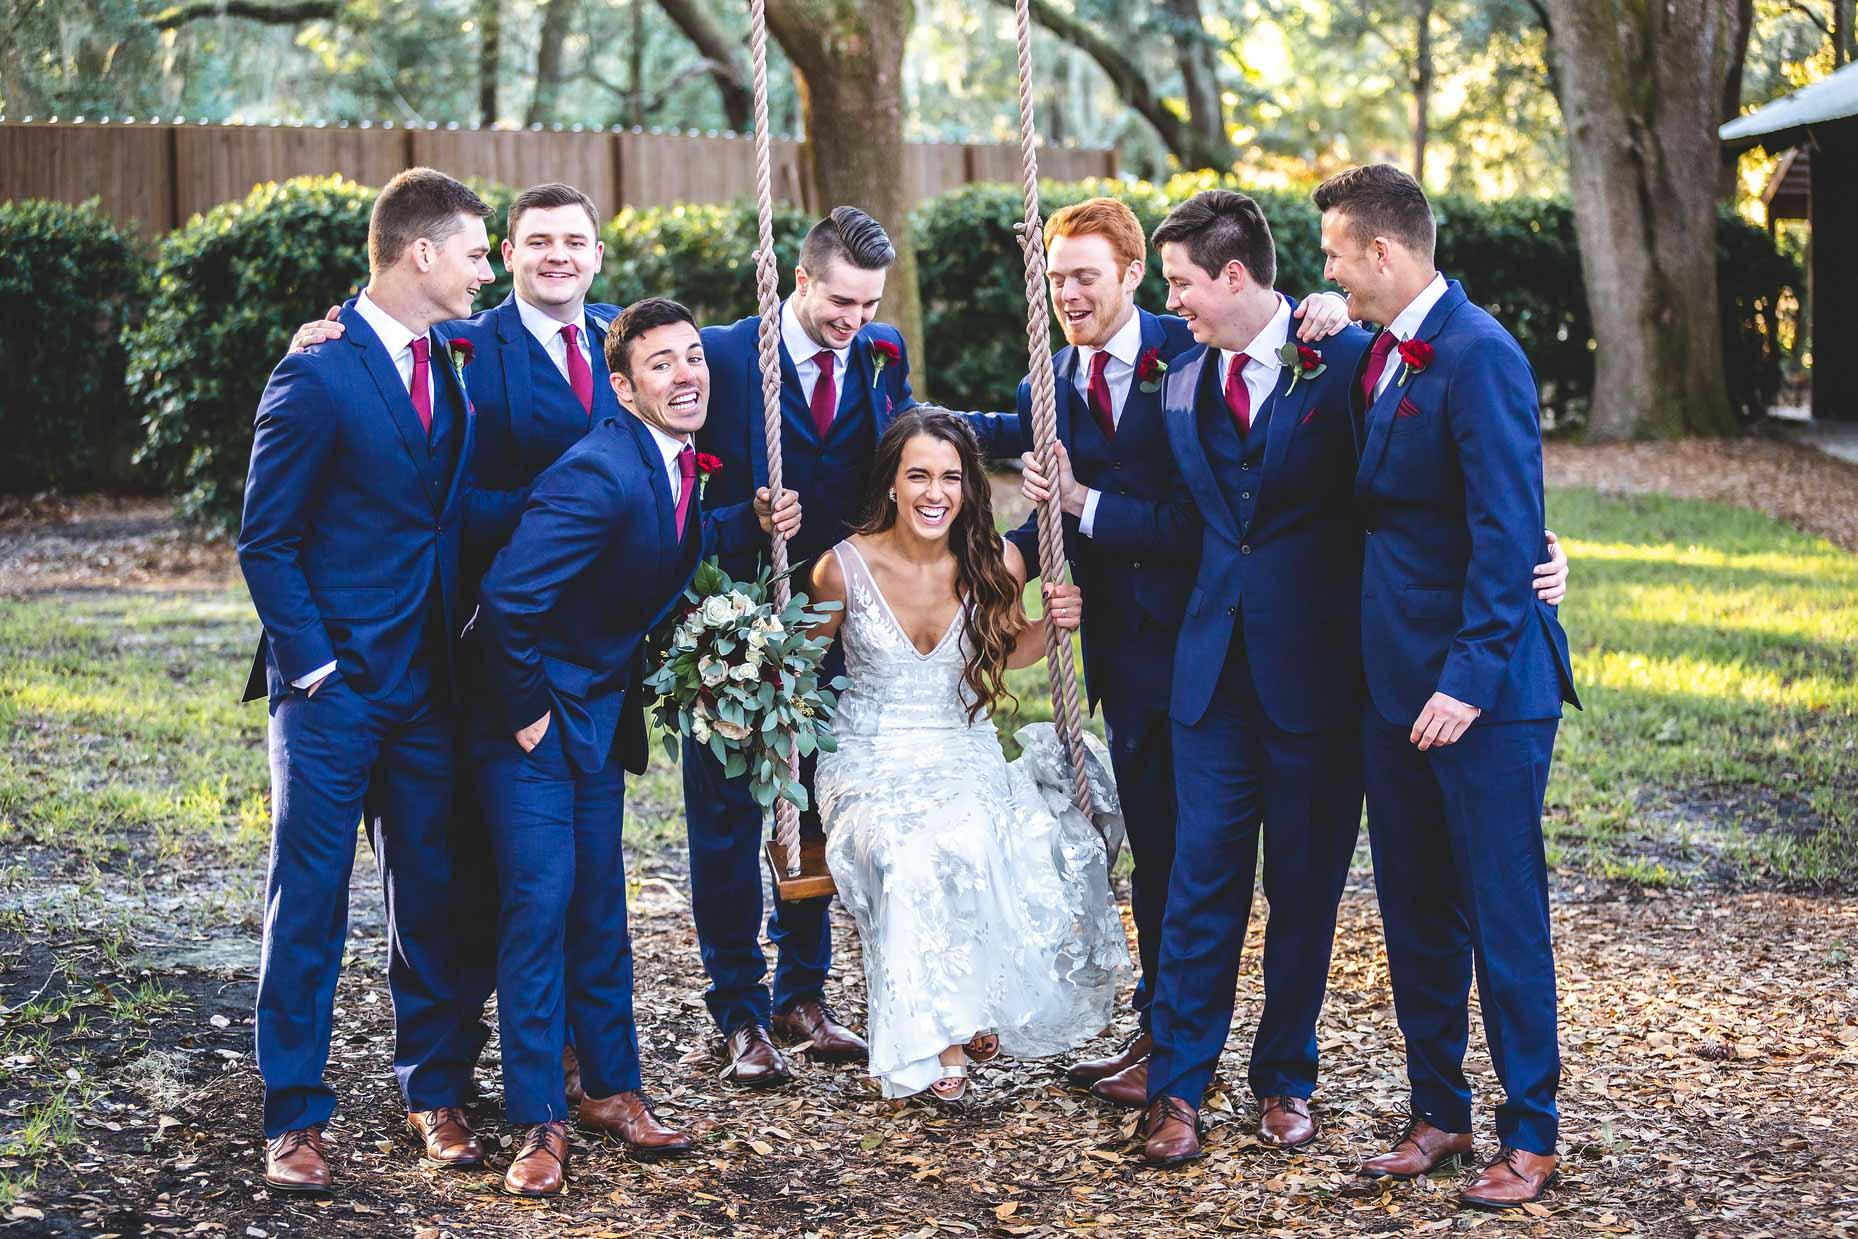 adam-szarmack-bowing-oaks-wedding-photographer-jacksonville-94.jpg